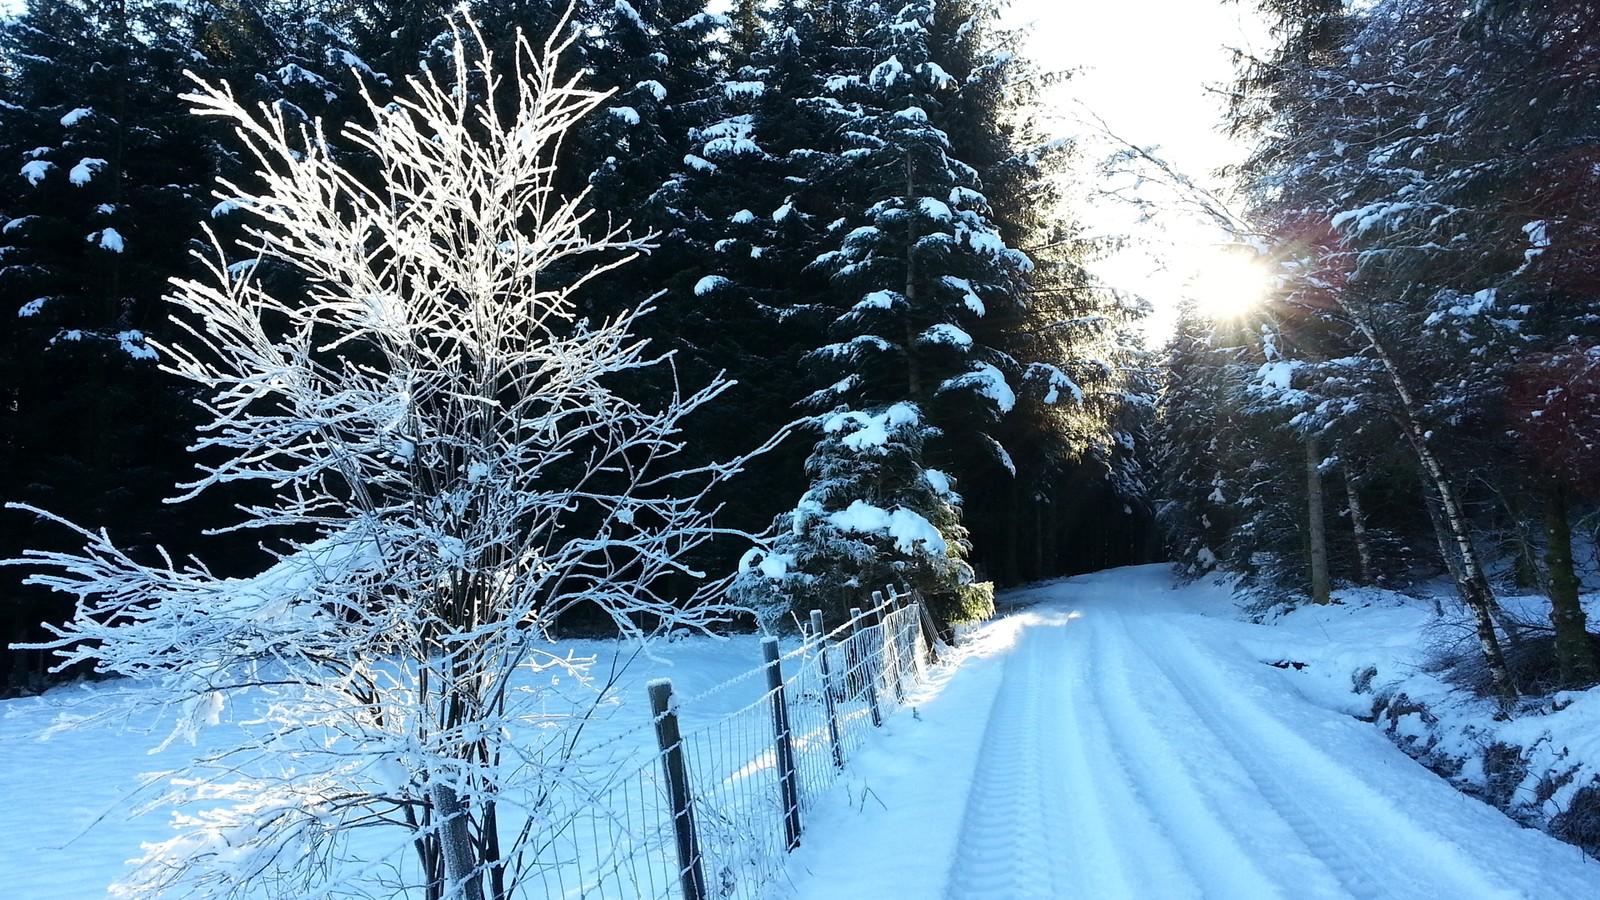 Vinter i Kringlelia på Kyllingstad i Gjesdal.